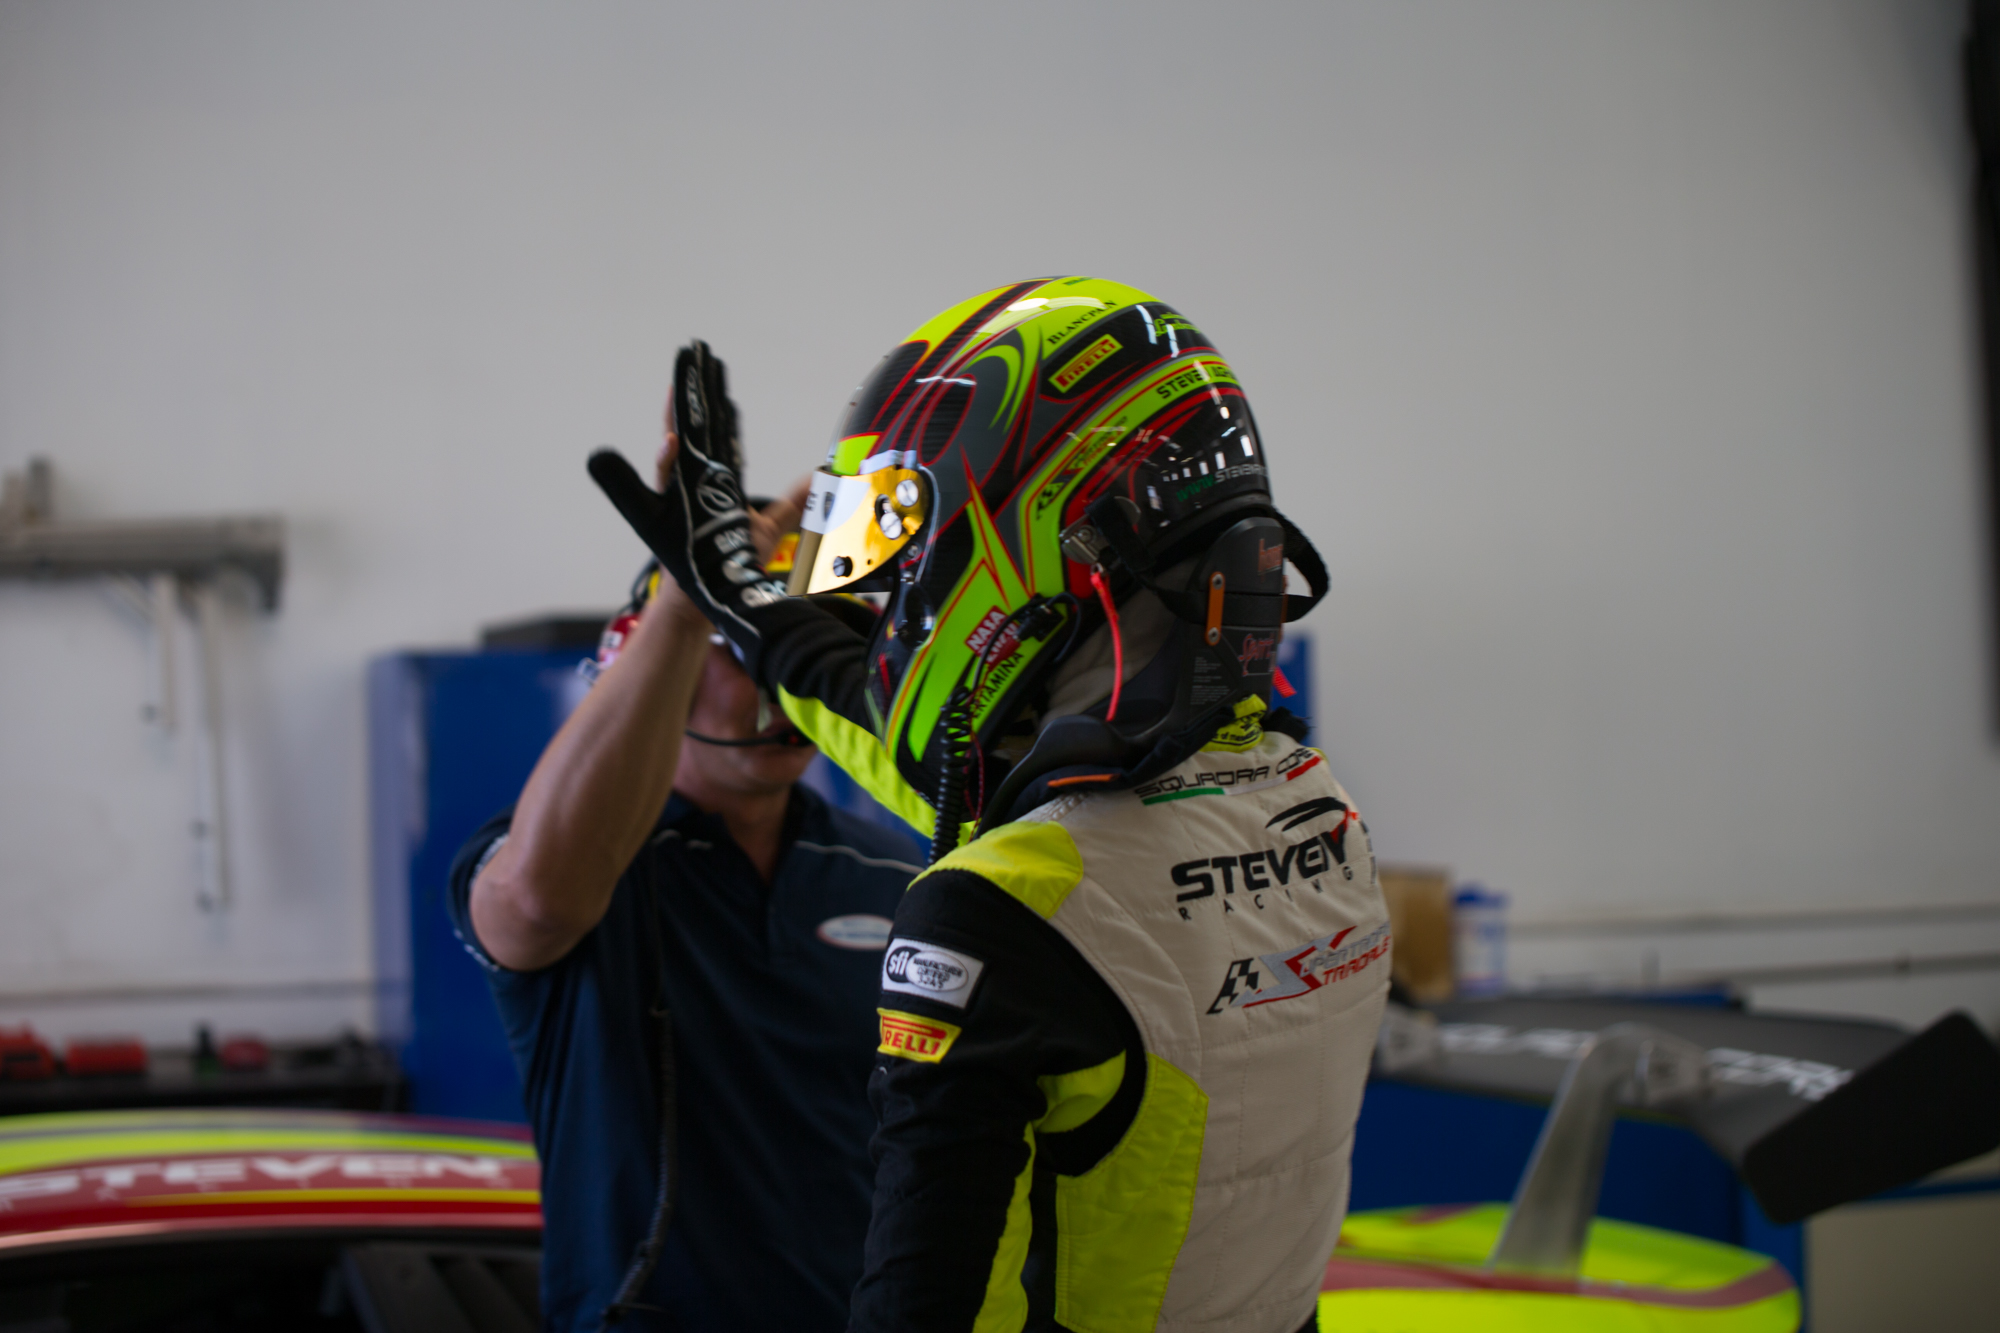 Steven-Racing-20171027-53634.jpg